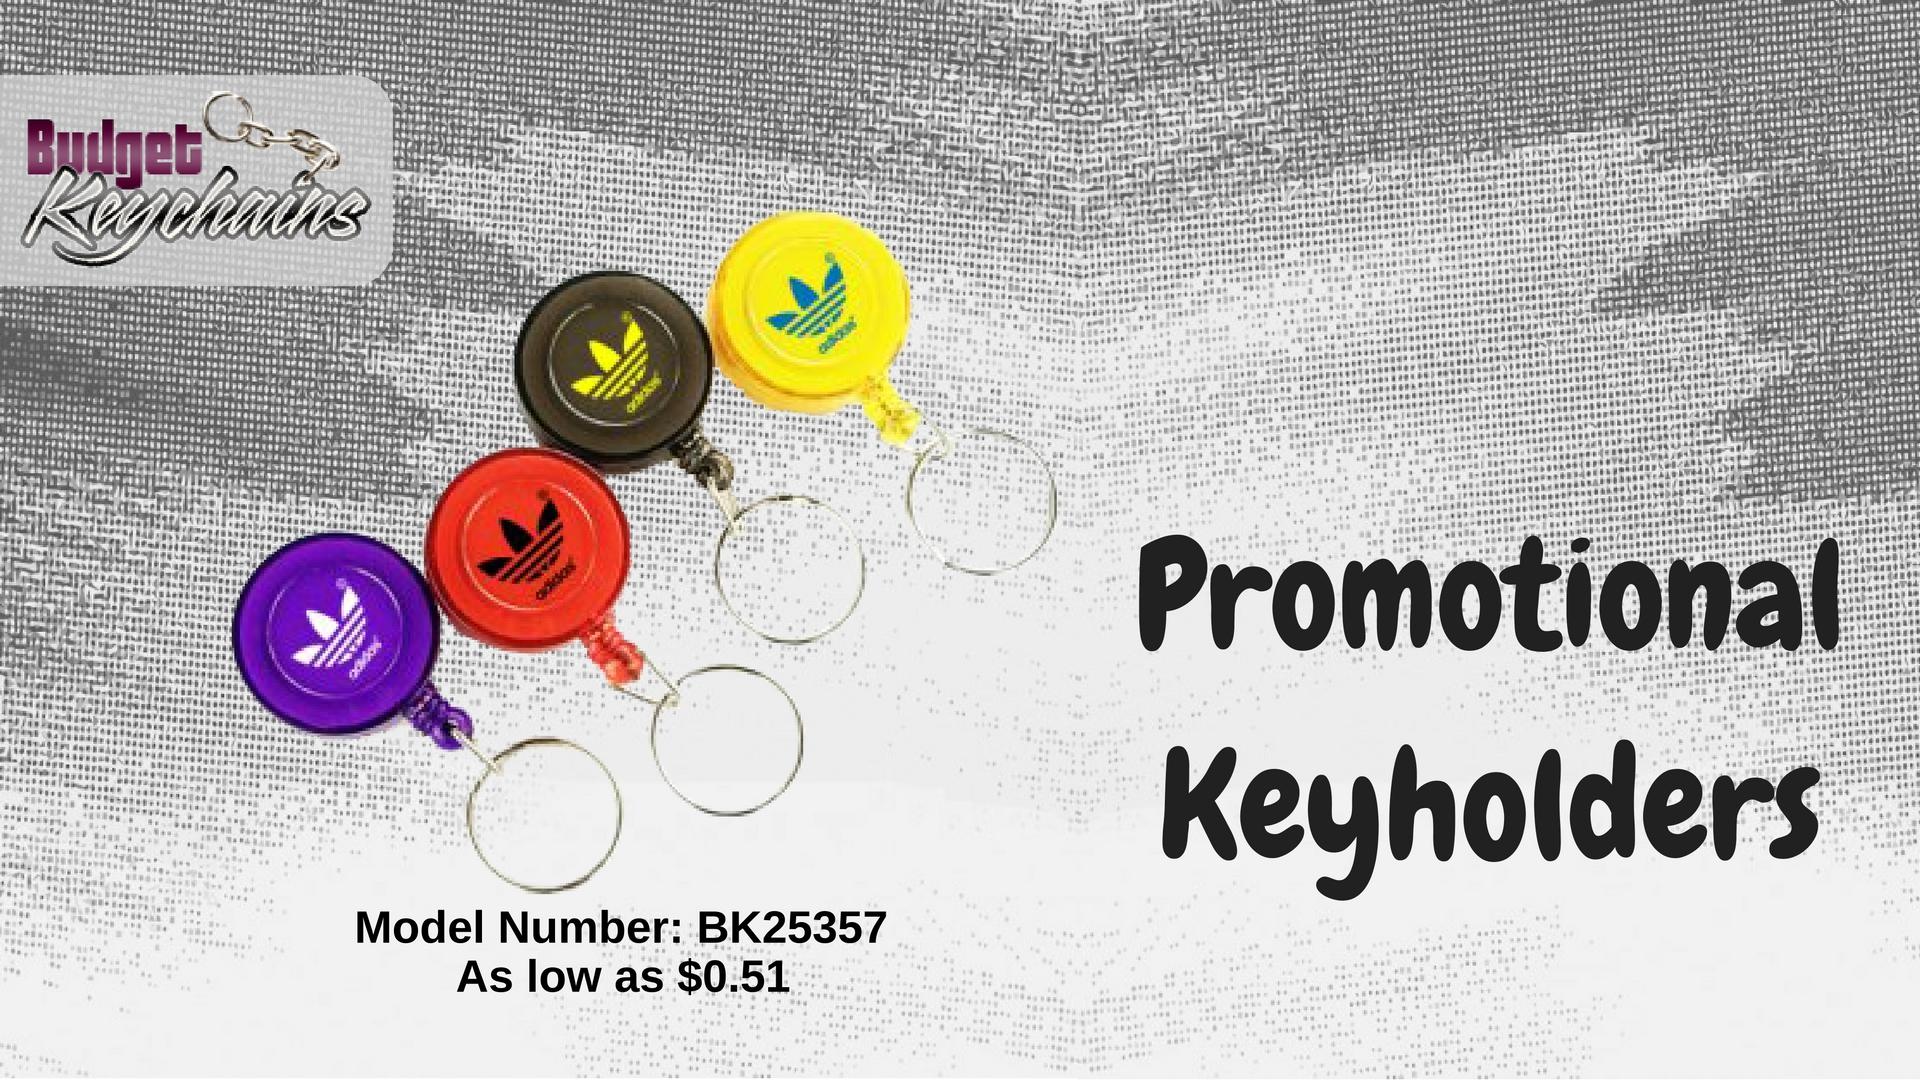 promotional-keyholders-holiday-season